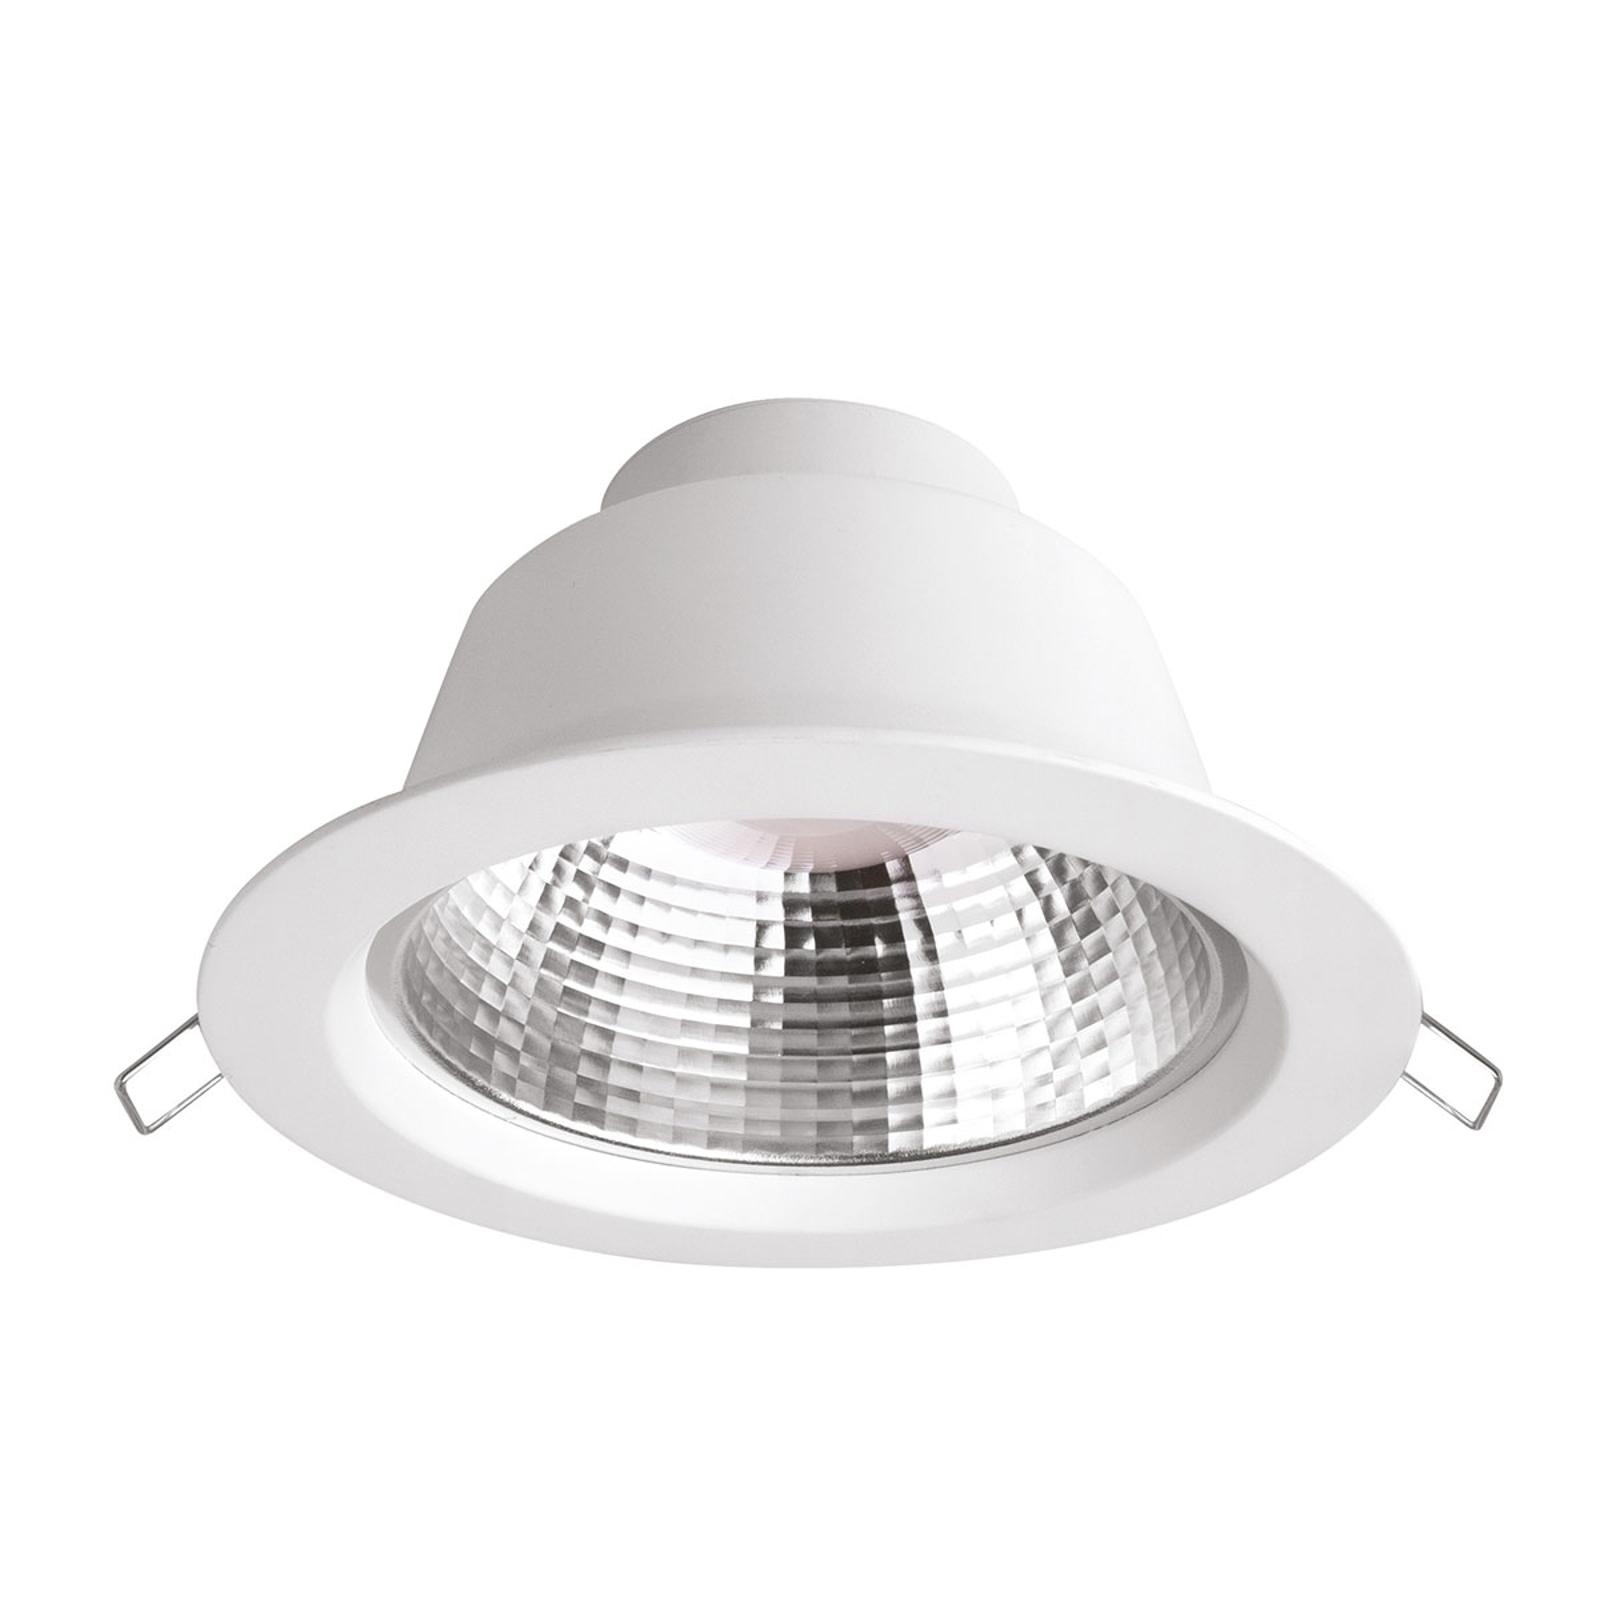 Siena LED-downlight, 9,5 W, 2 800 K